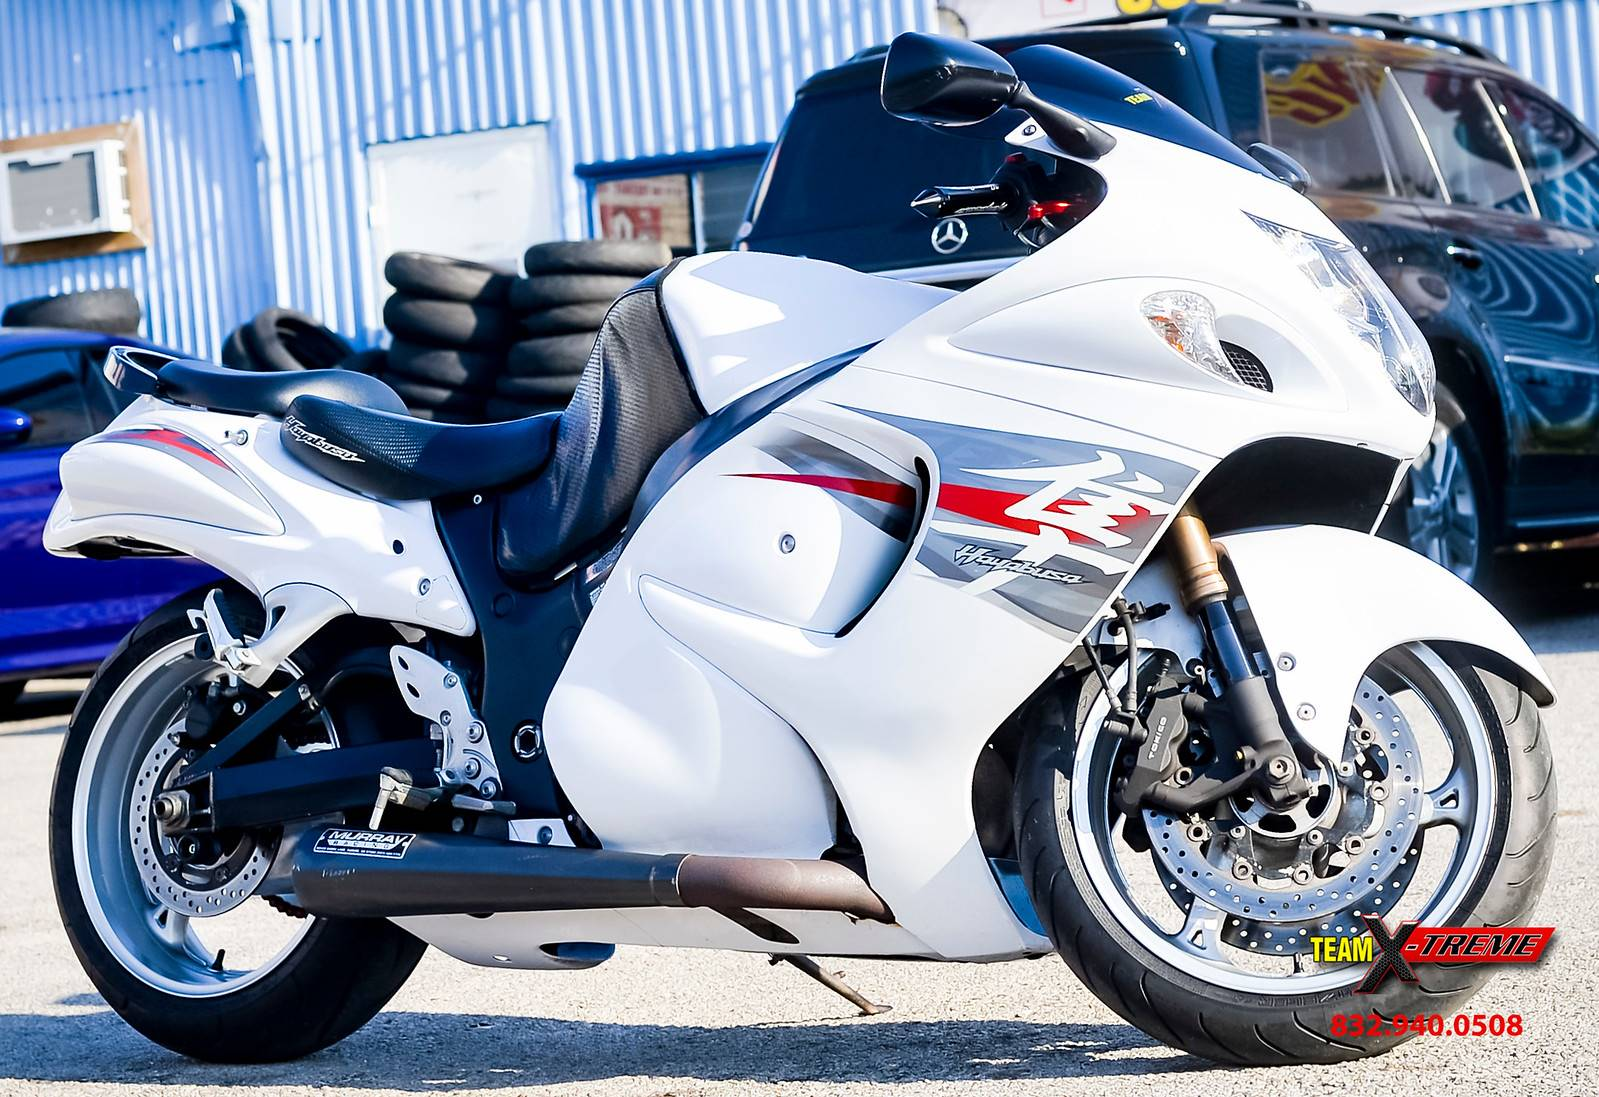 2012 Suzuki Hayabusa for sale 158423